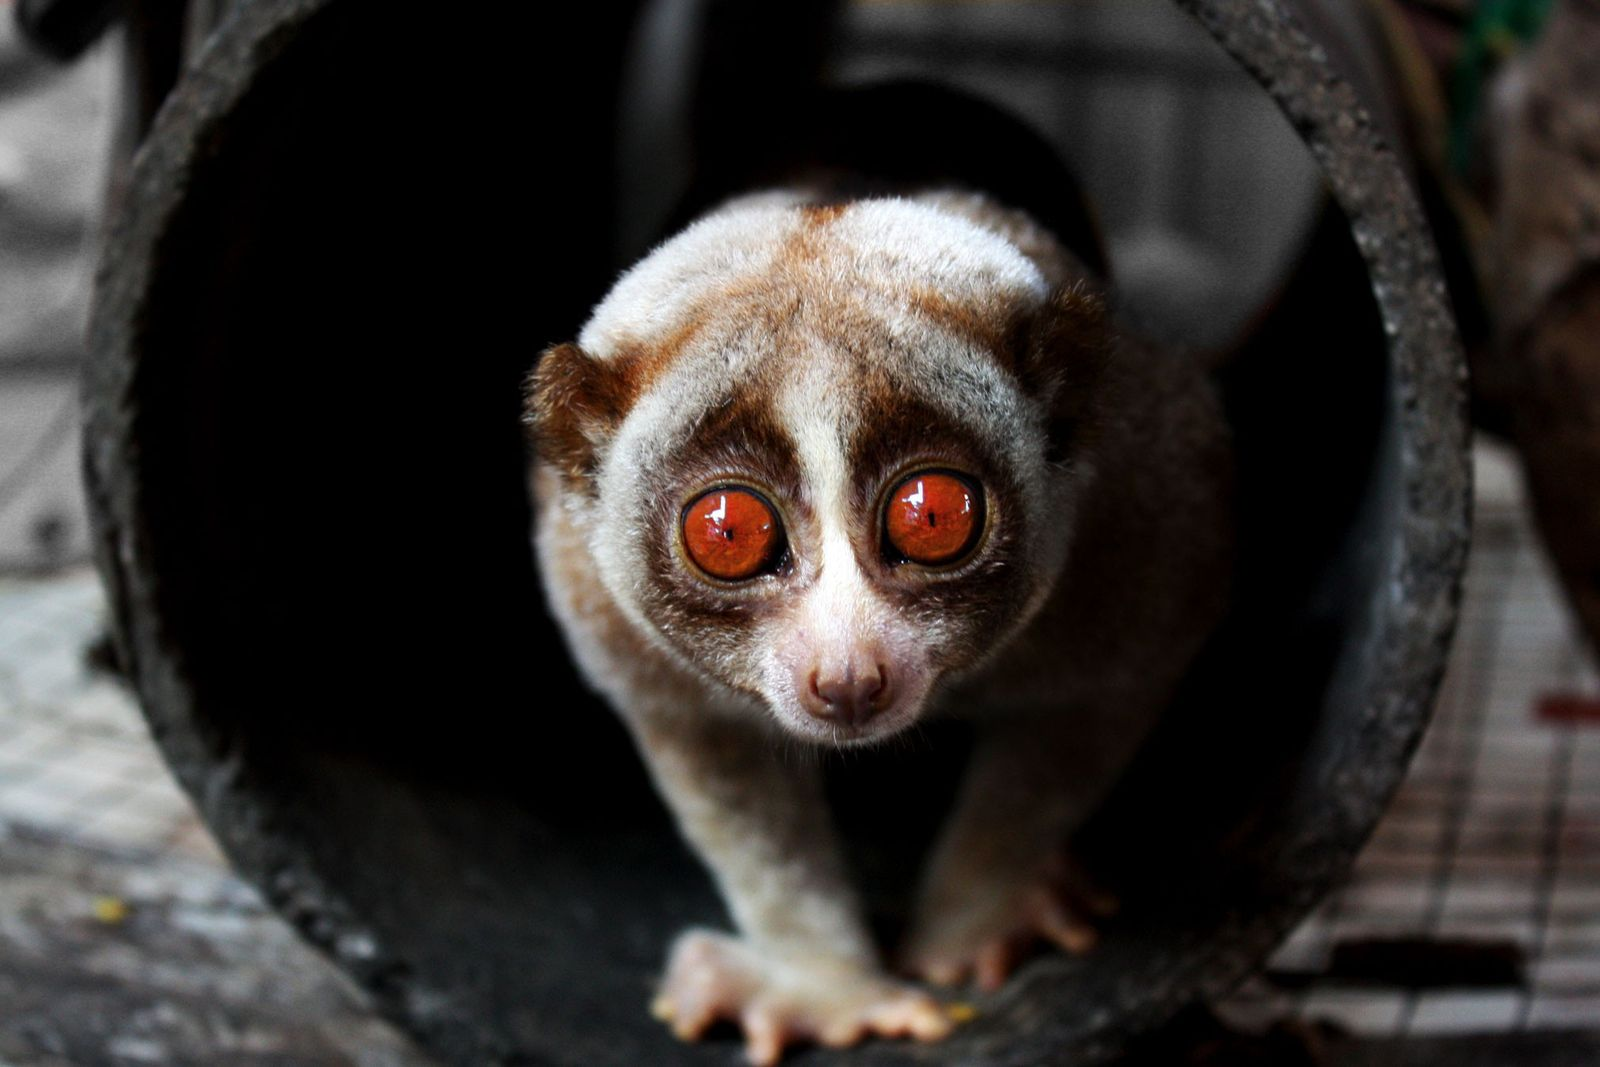 World's slowest animals prove speed isn't everything